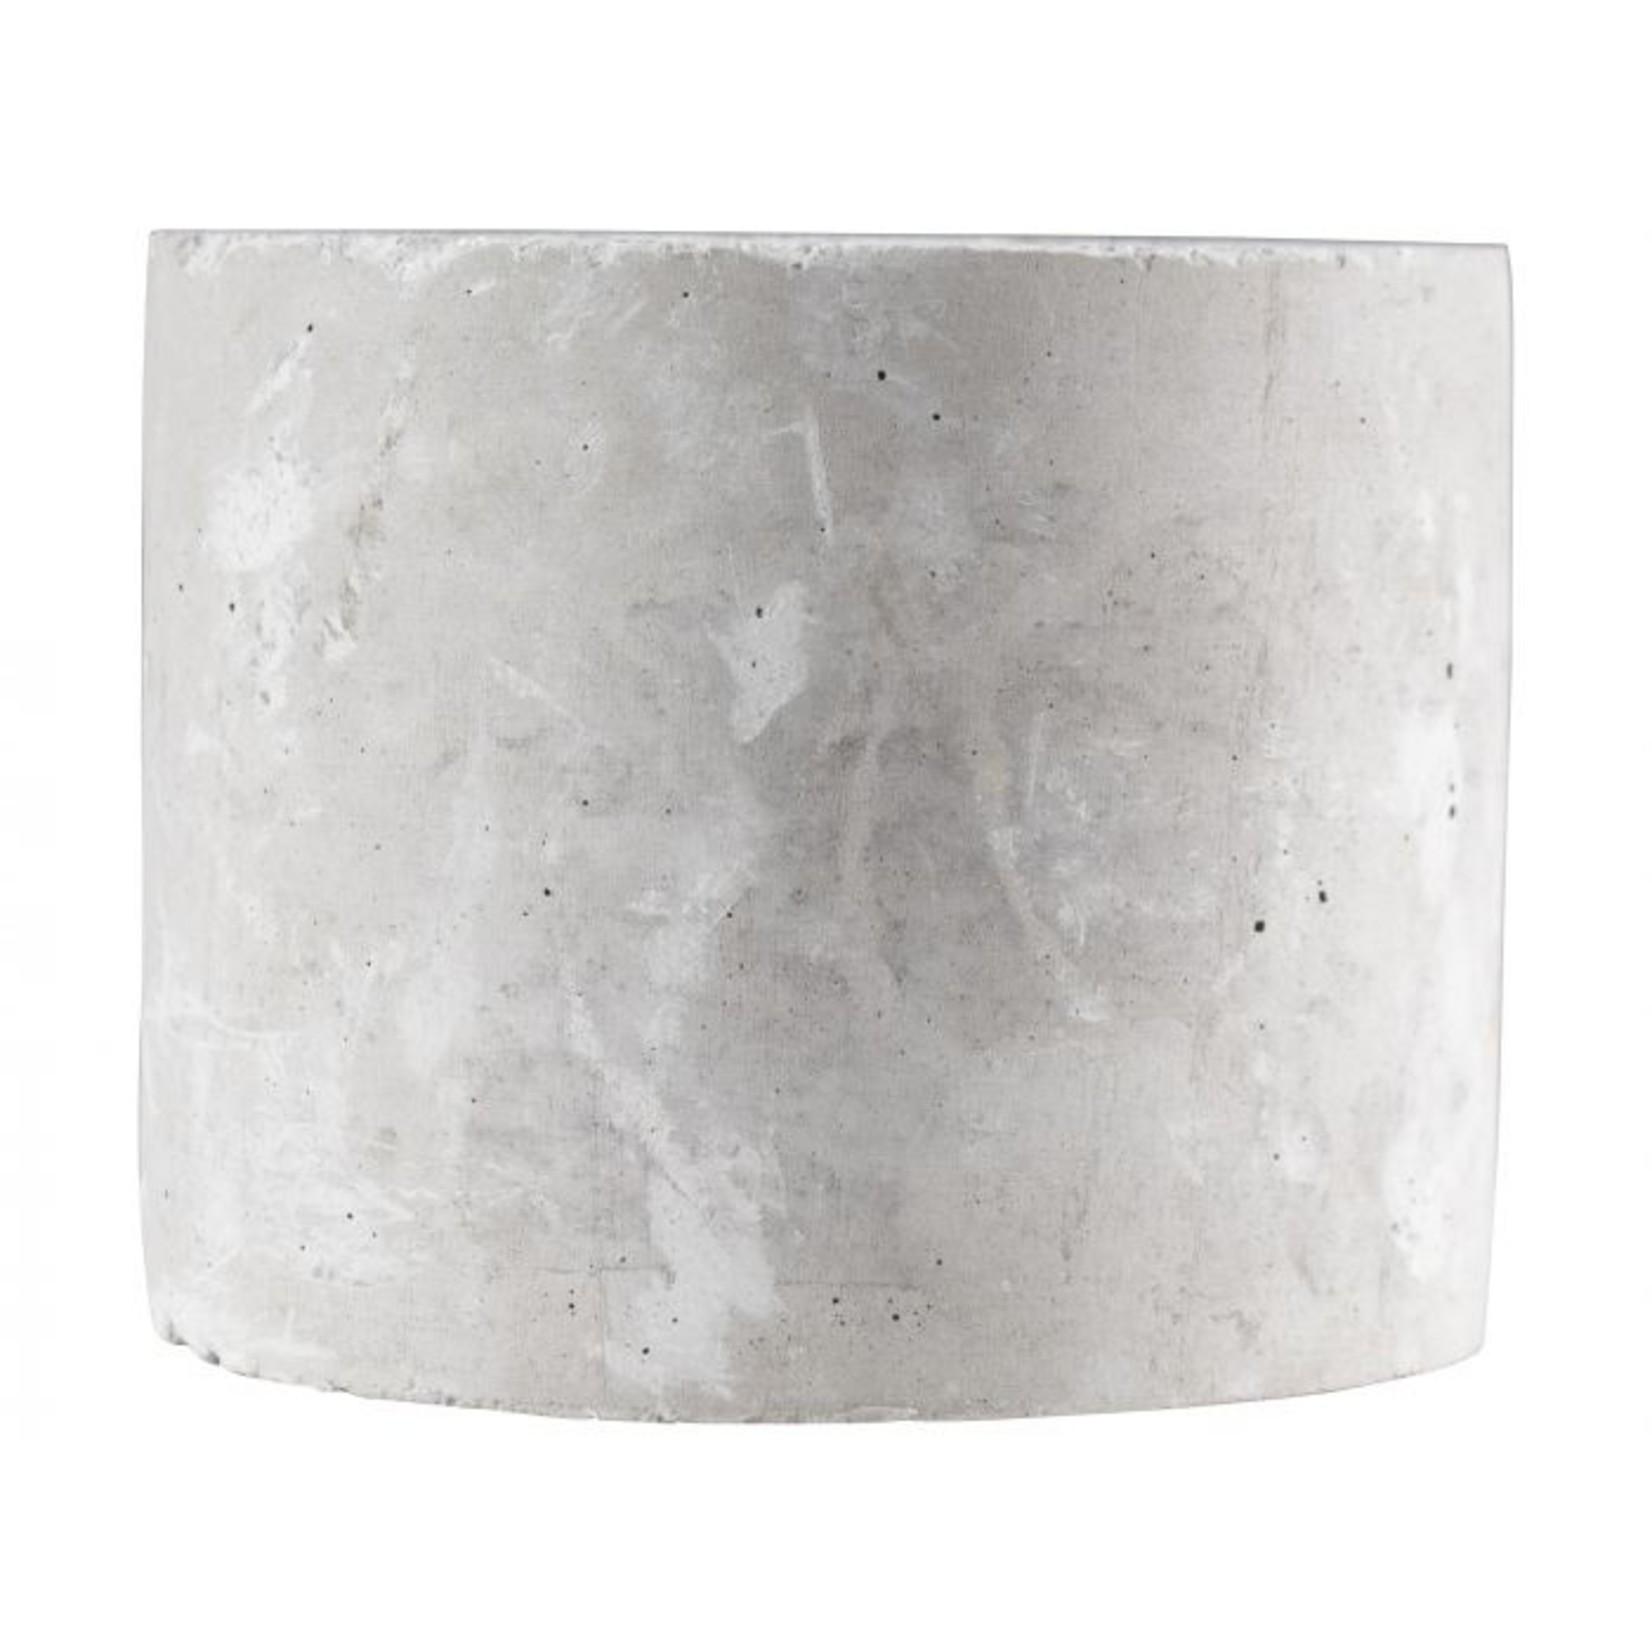 Kaars cement 11.5x9